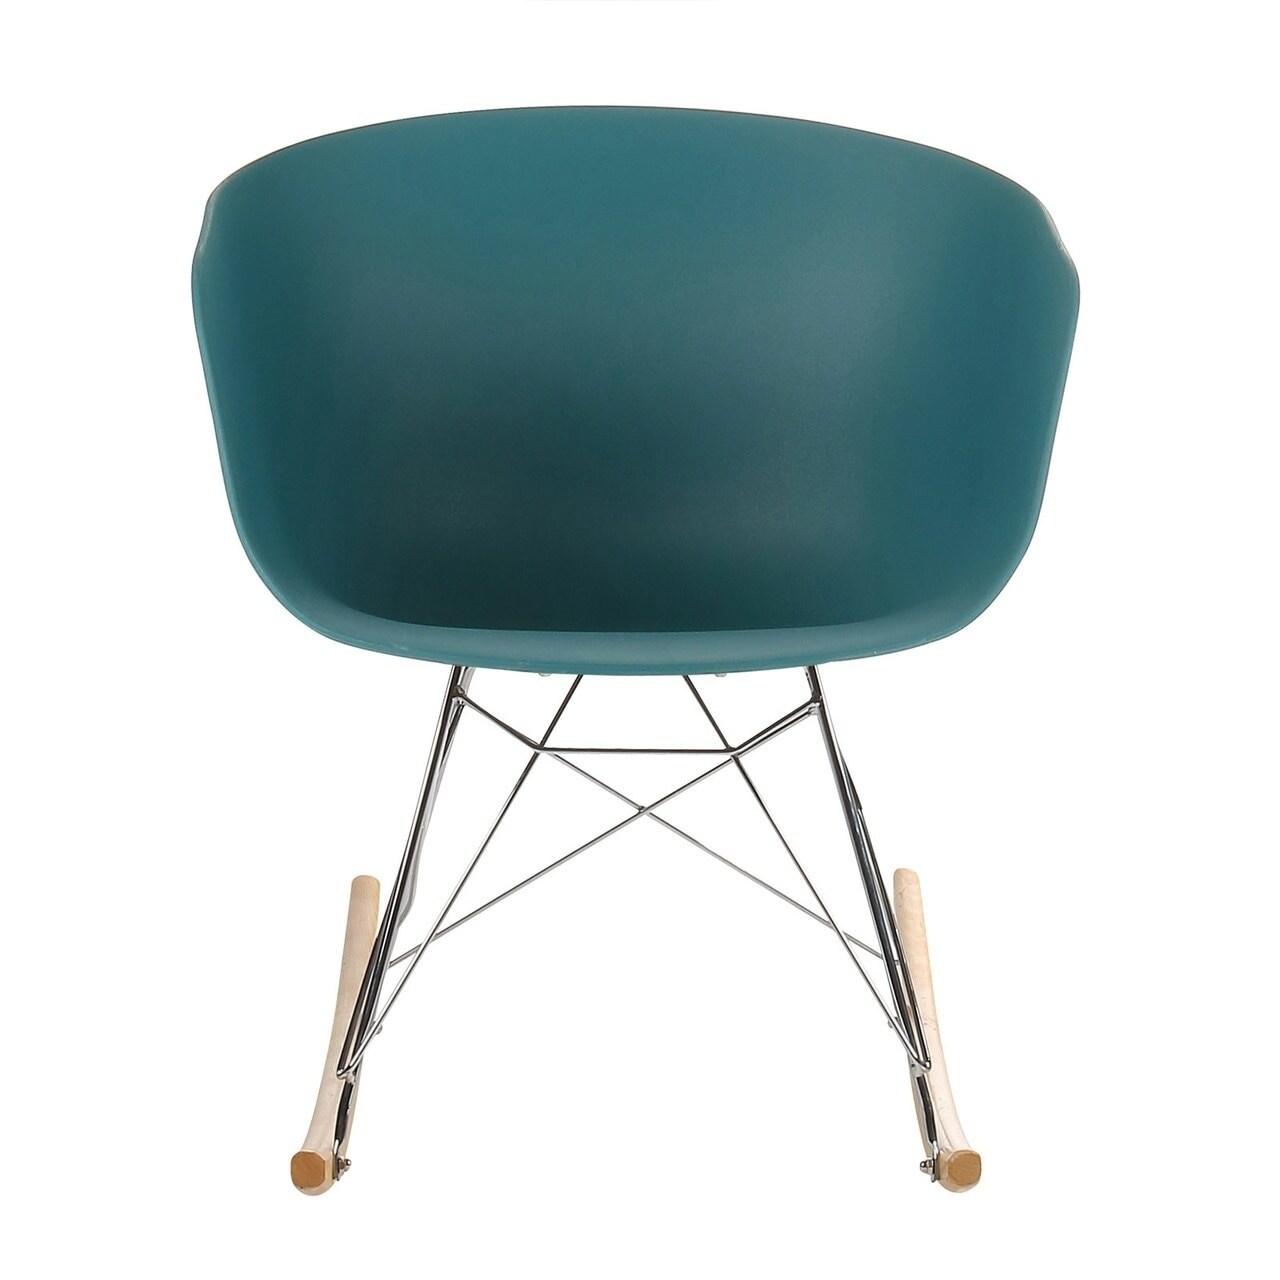 Danish Modern Rocking Chair On Sale Overstock 24249836